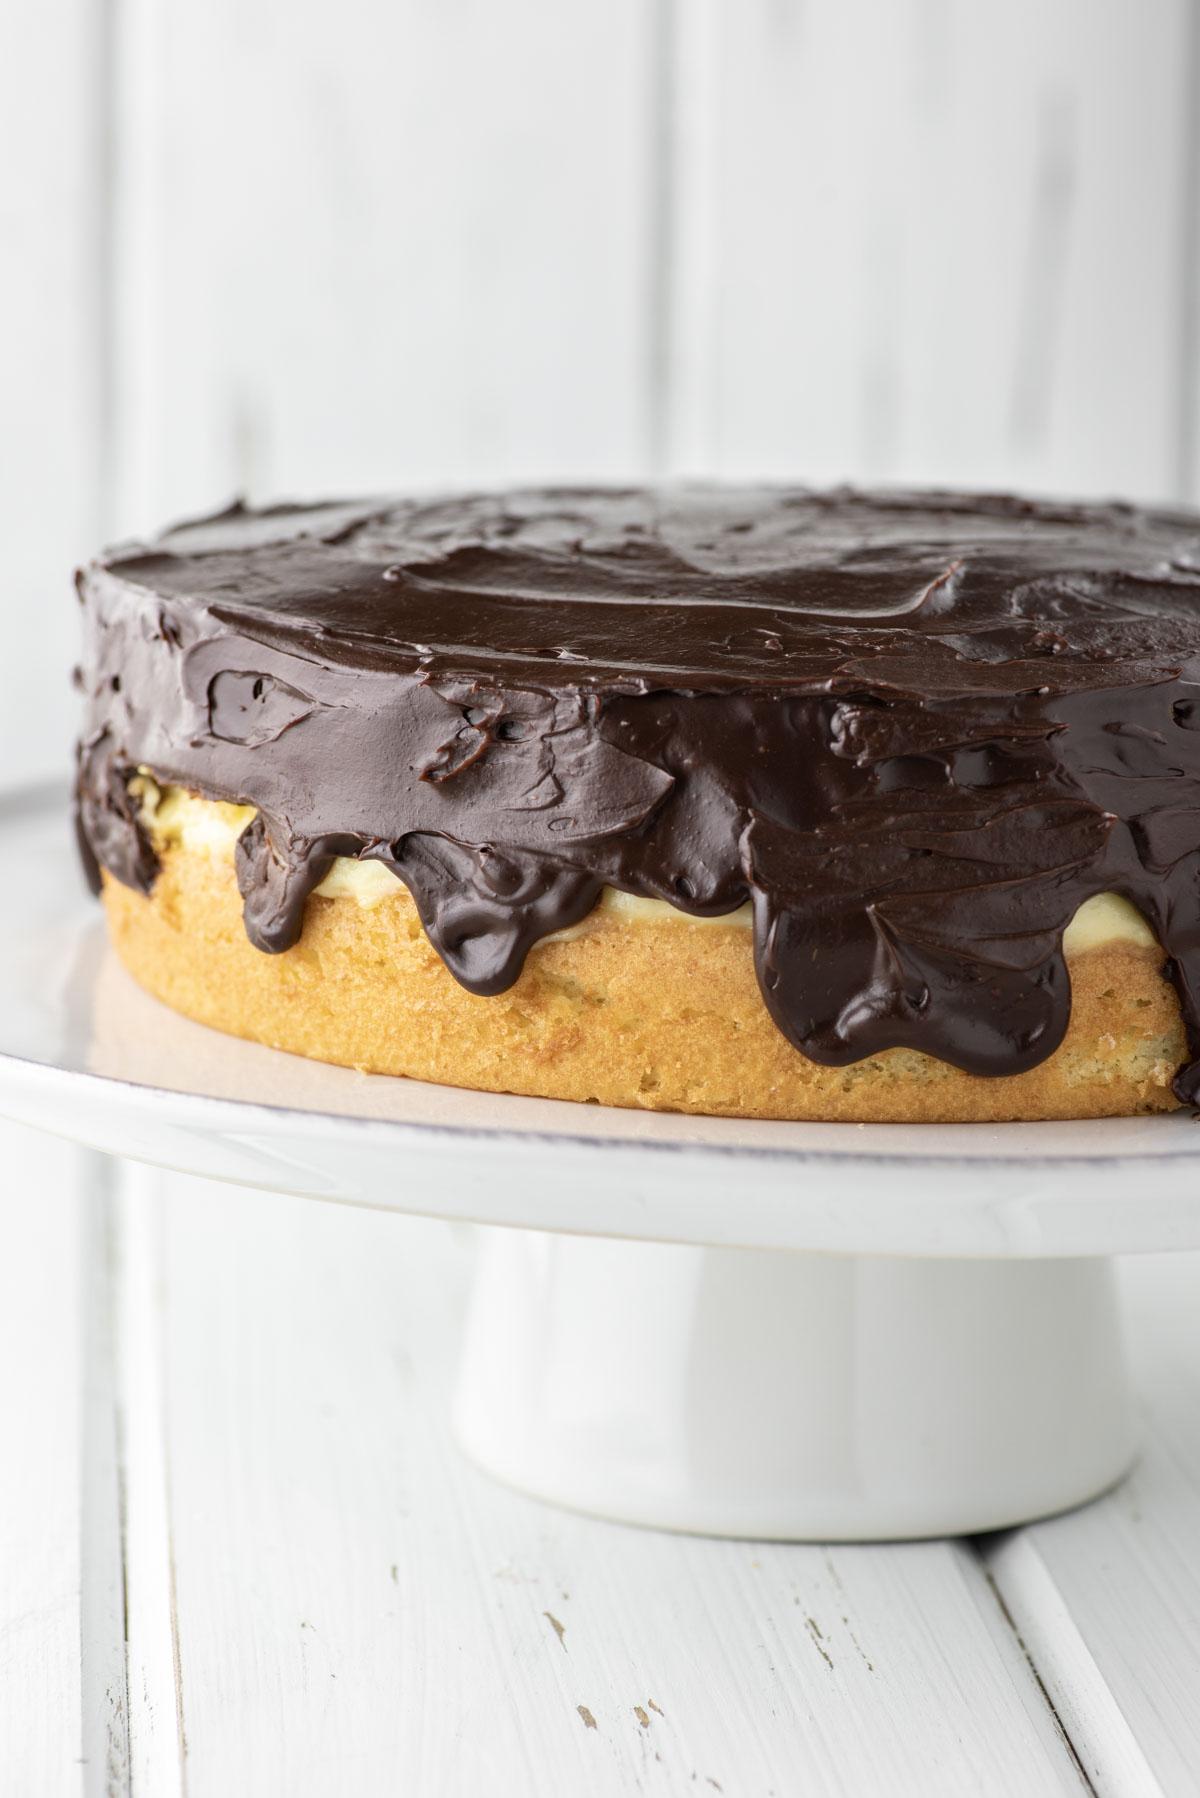 cake with cream and chocolate ganache on white plate